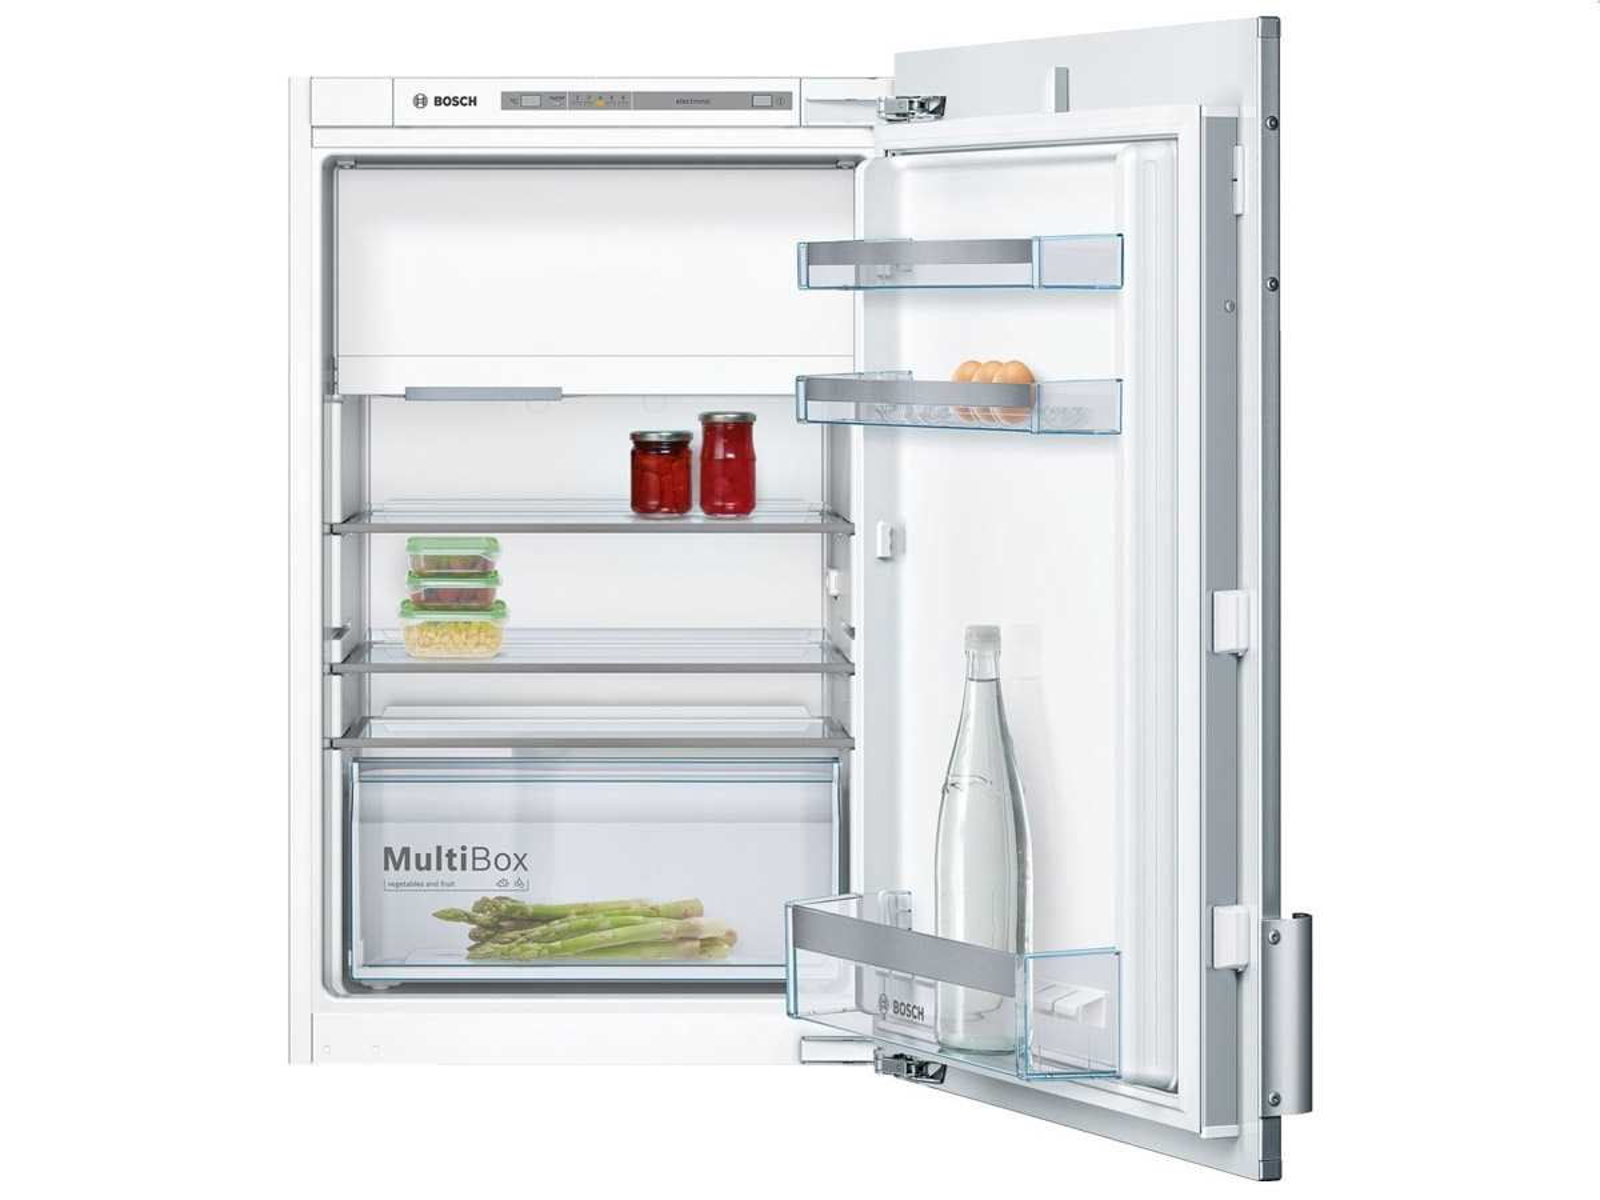 Bosch Kühlschrank Biofresh : Bosch kfl vf set bosch einbaukühlschrank kil vf bosch